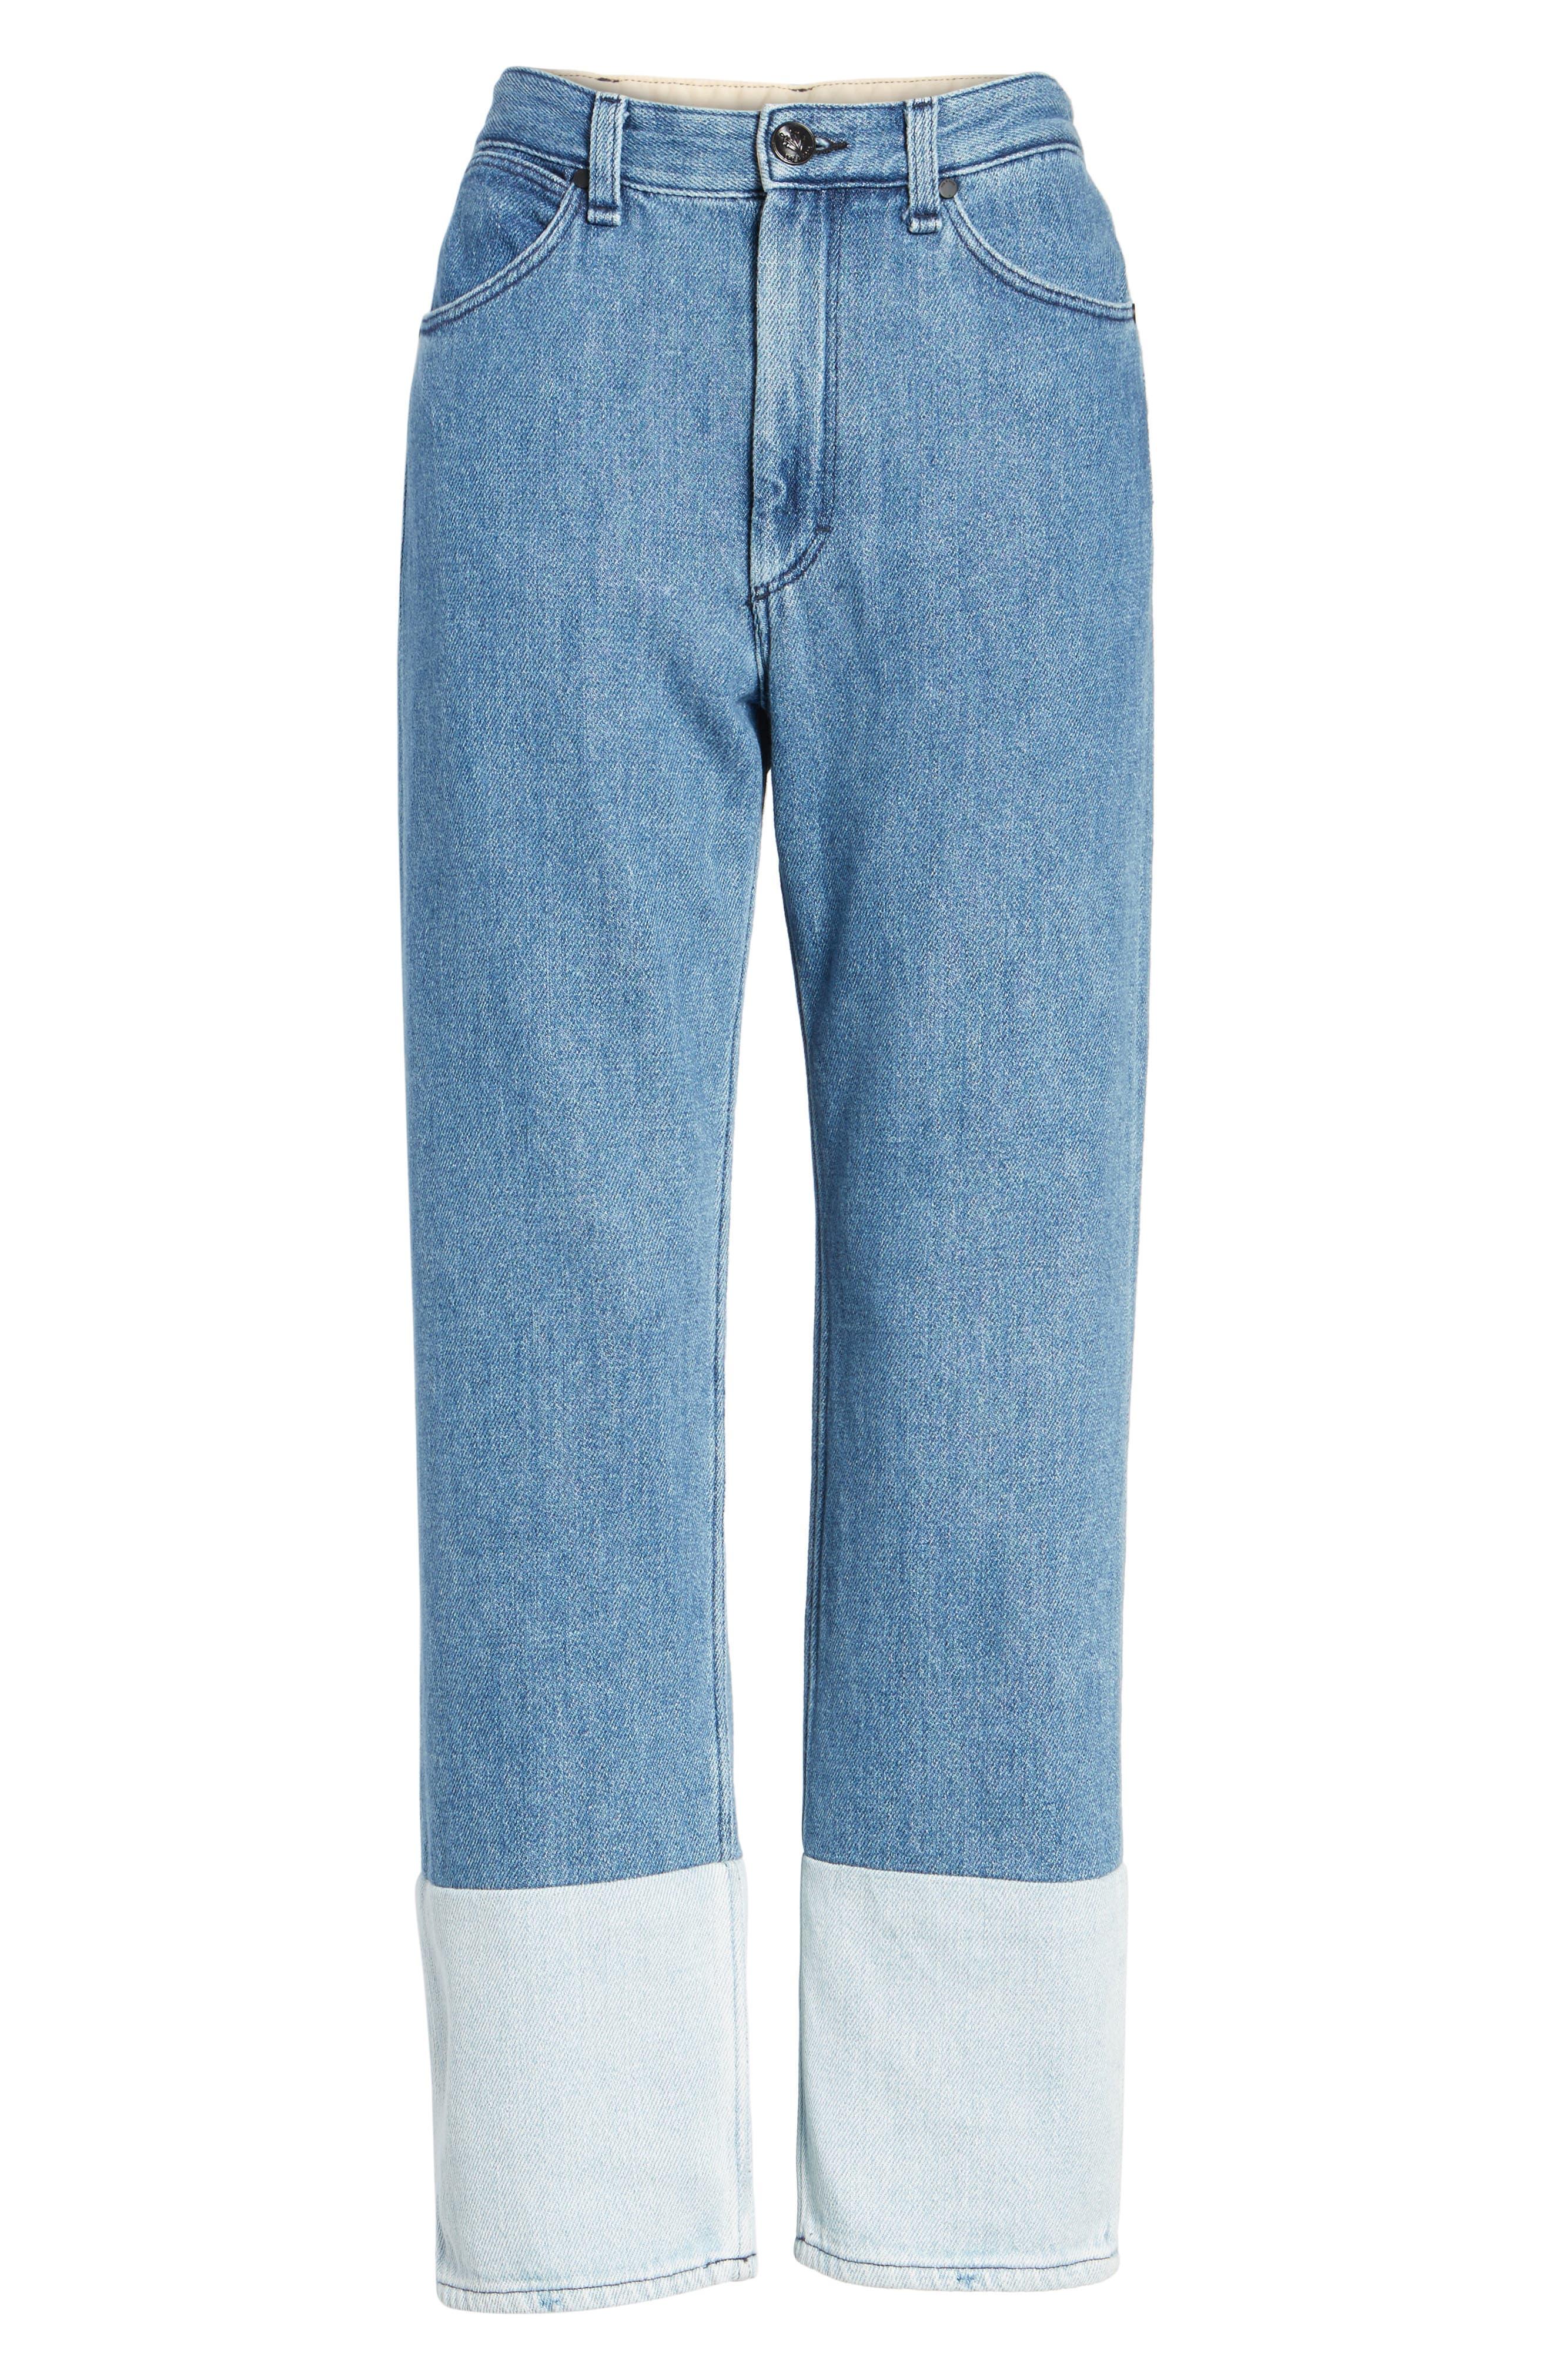 High Waist Straight Leg Jeans,                             Alternate thumbnail 6, color,                             404